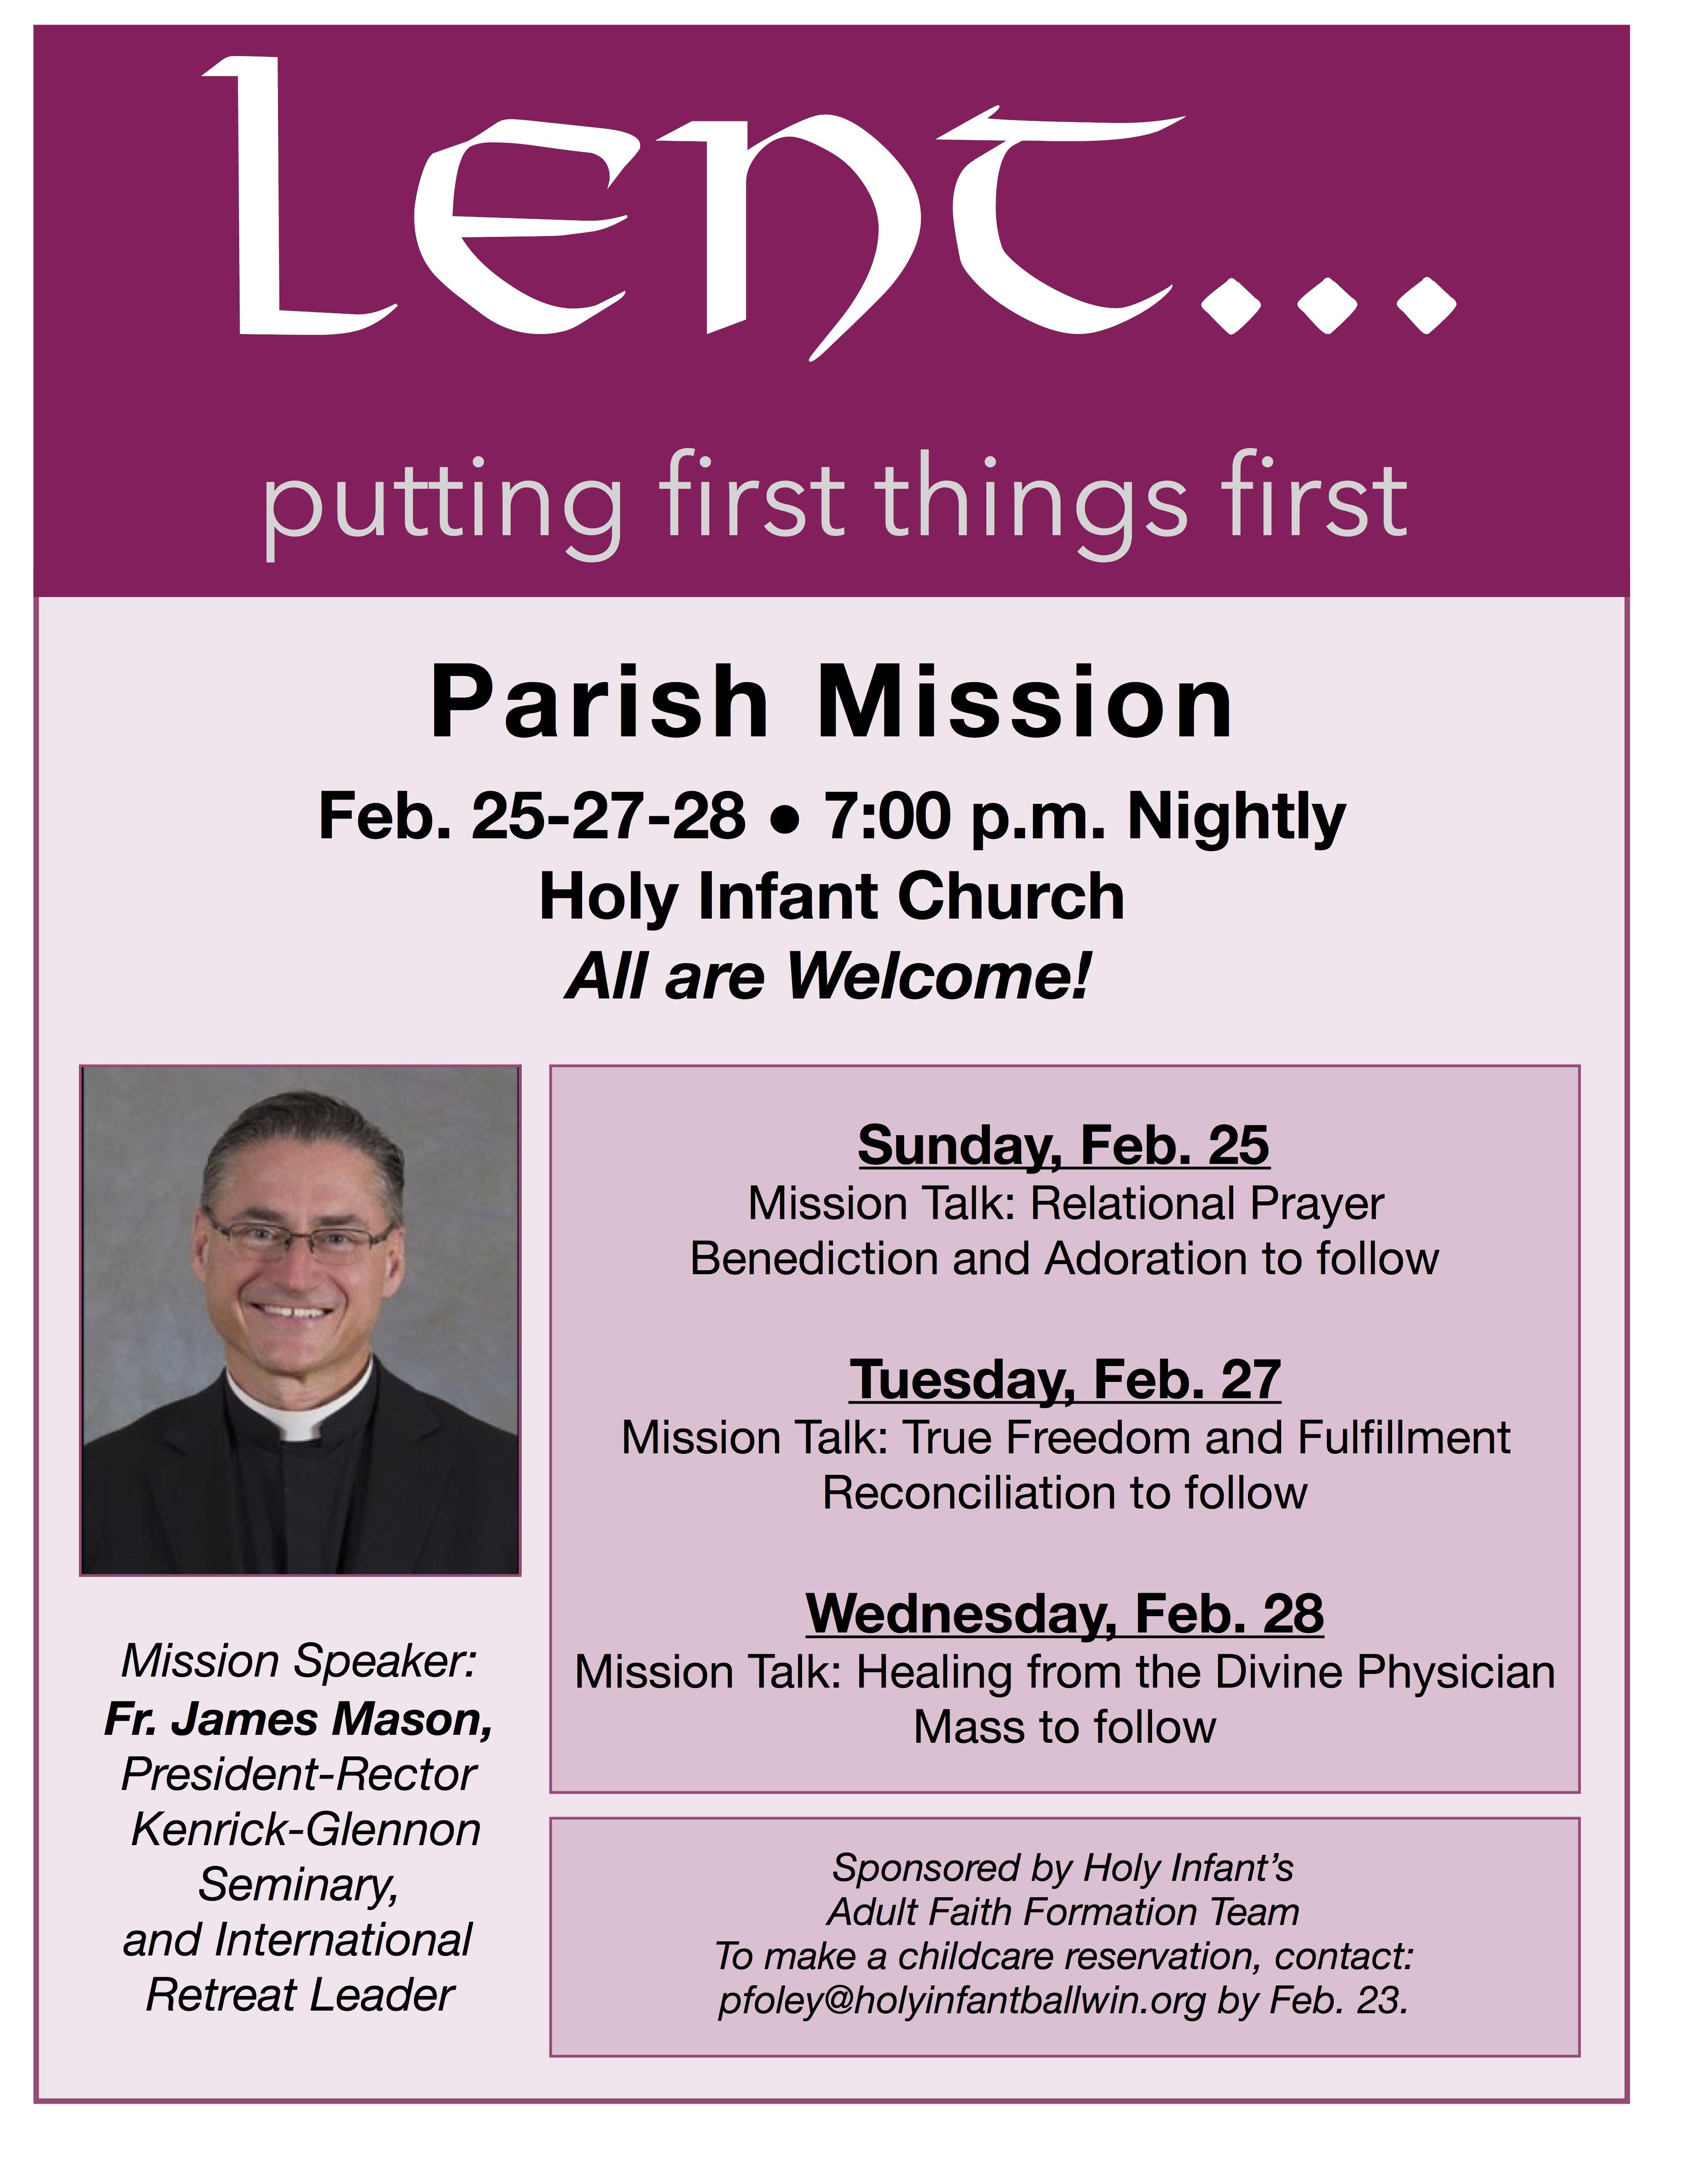 Parish Mission with Fr. James Mason @ Church